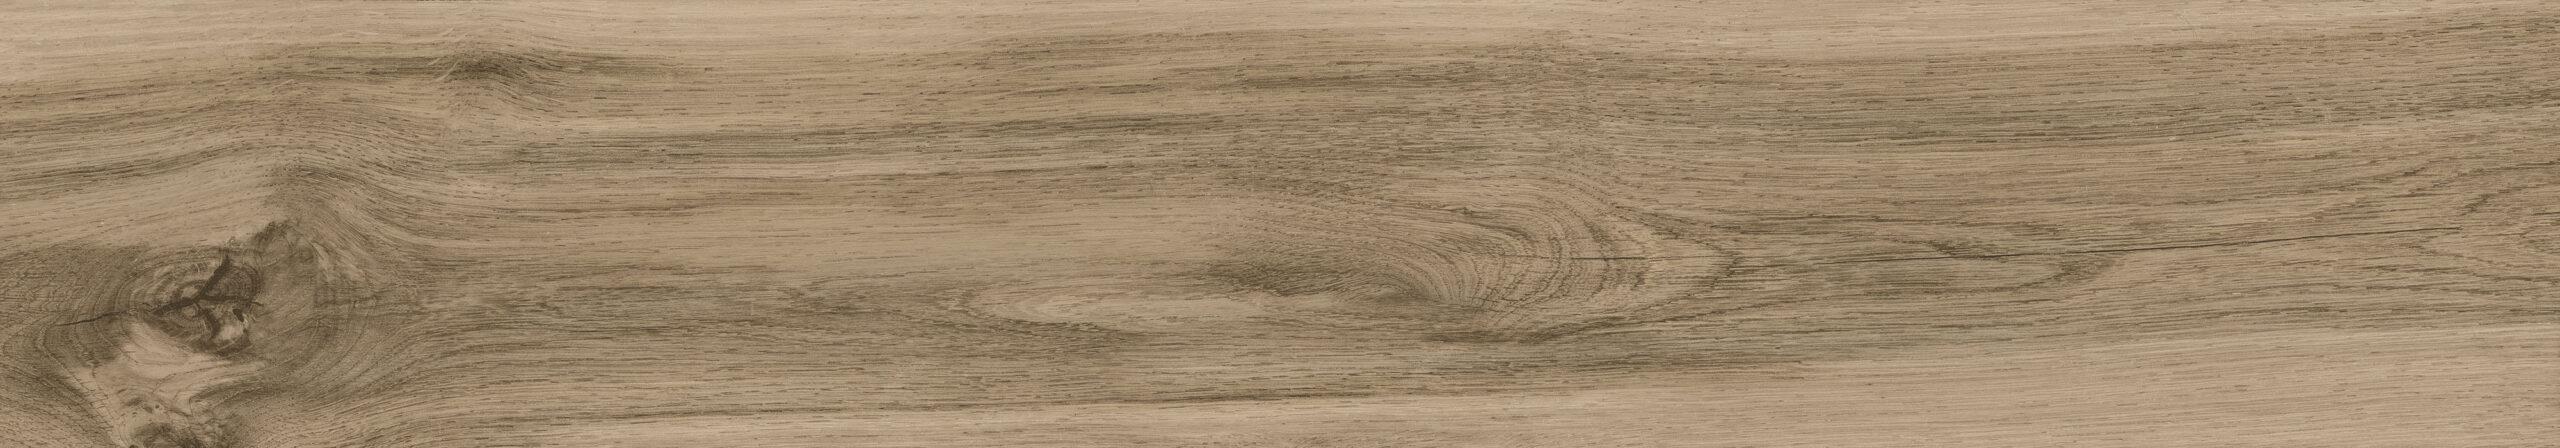 Essential Wood Elm 20x114cm